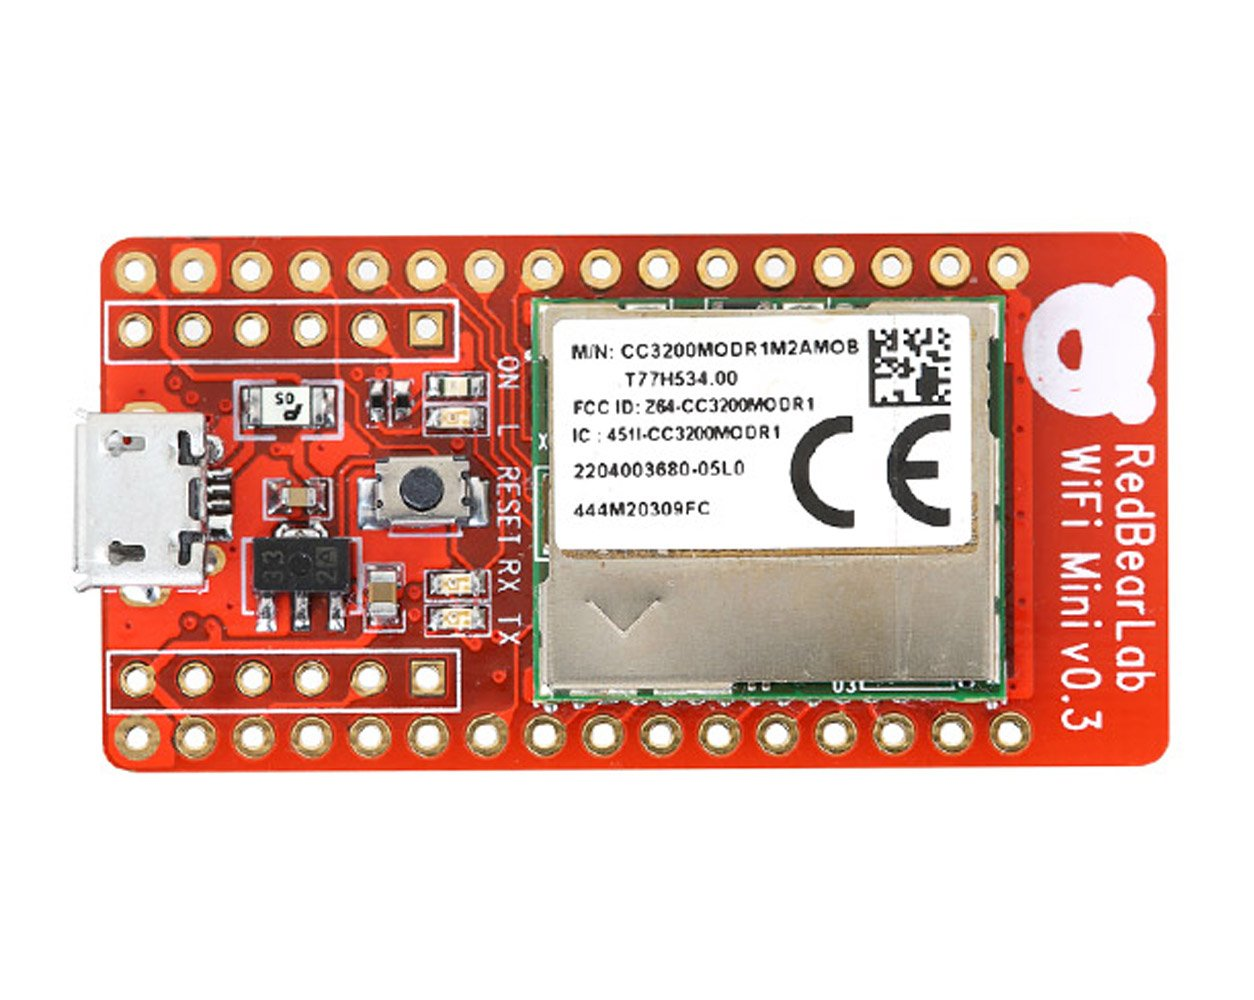 eleduino redbearlab cc3200 wifi mini